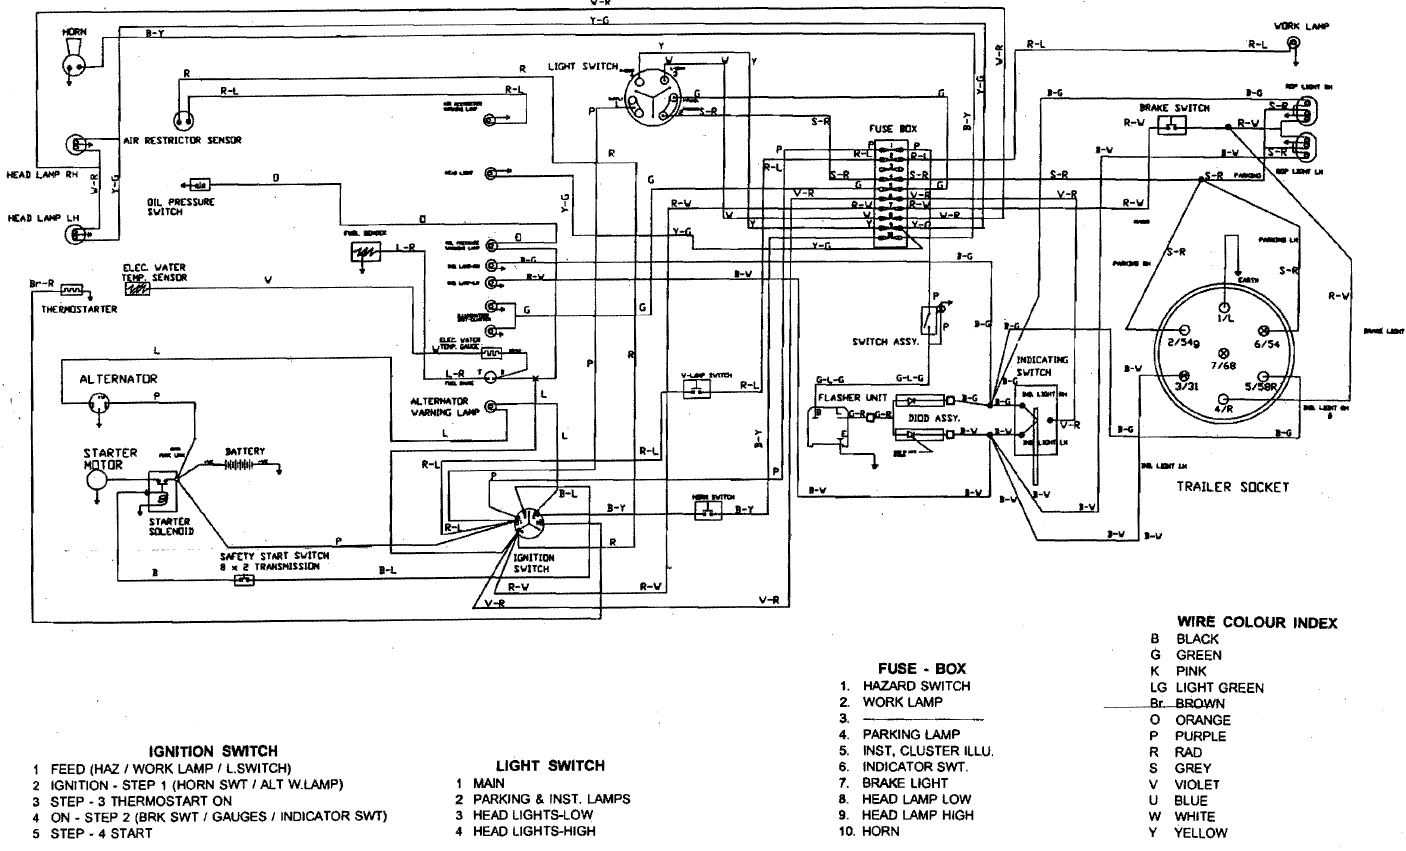 g110 john deere wiring diagram wiring diagram john deere g110 wiring diagram wiring diagramstx 38 pto switch wiring diagramsmall resolution of john deere